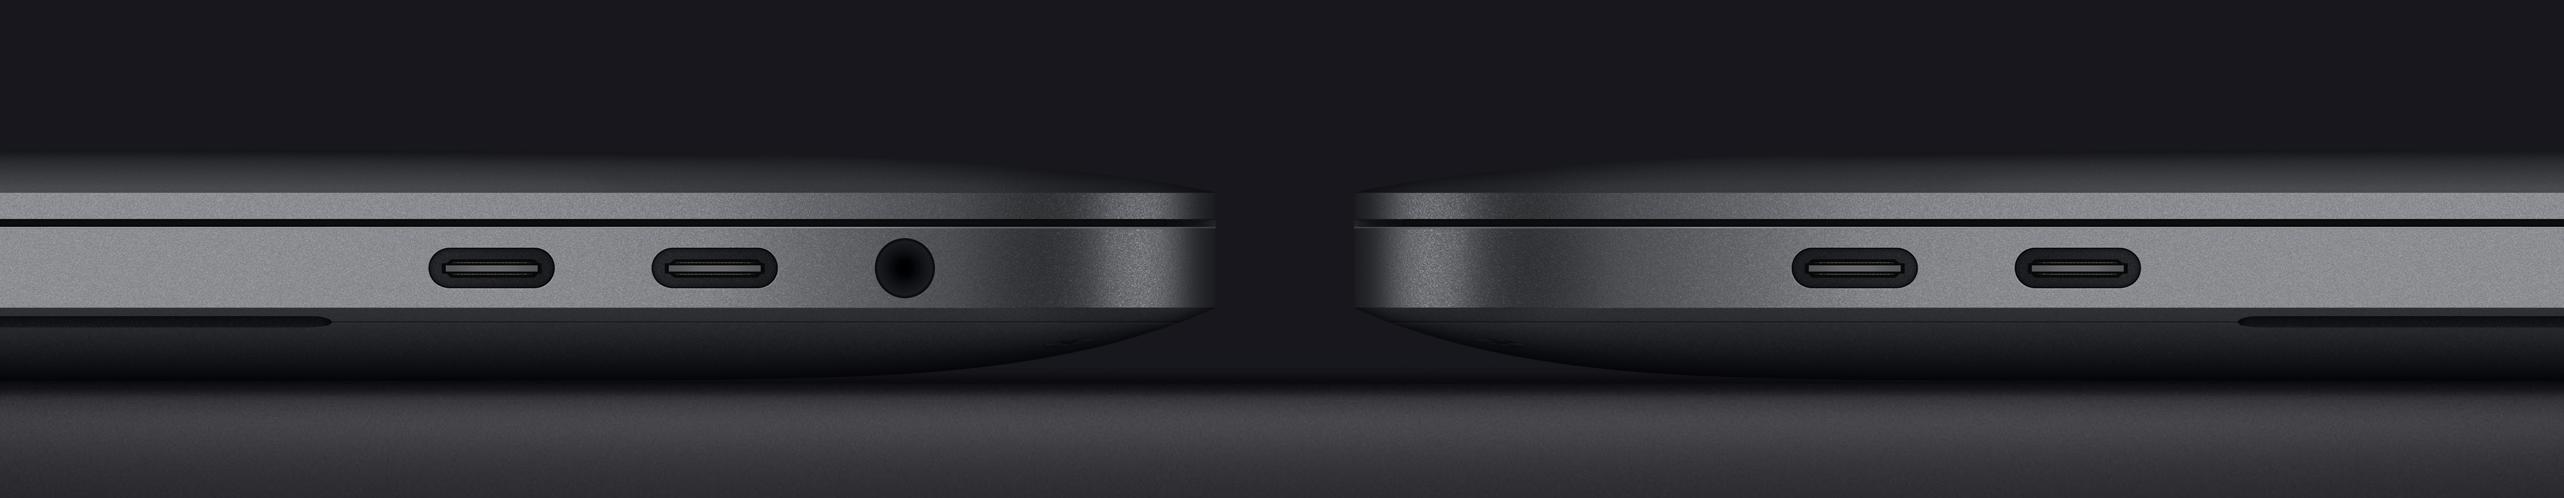 MacBook Pro 13-inch 2020 dimensions